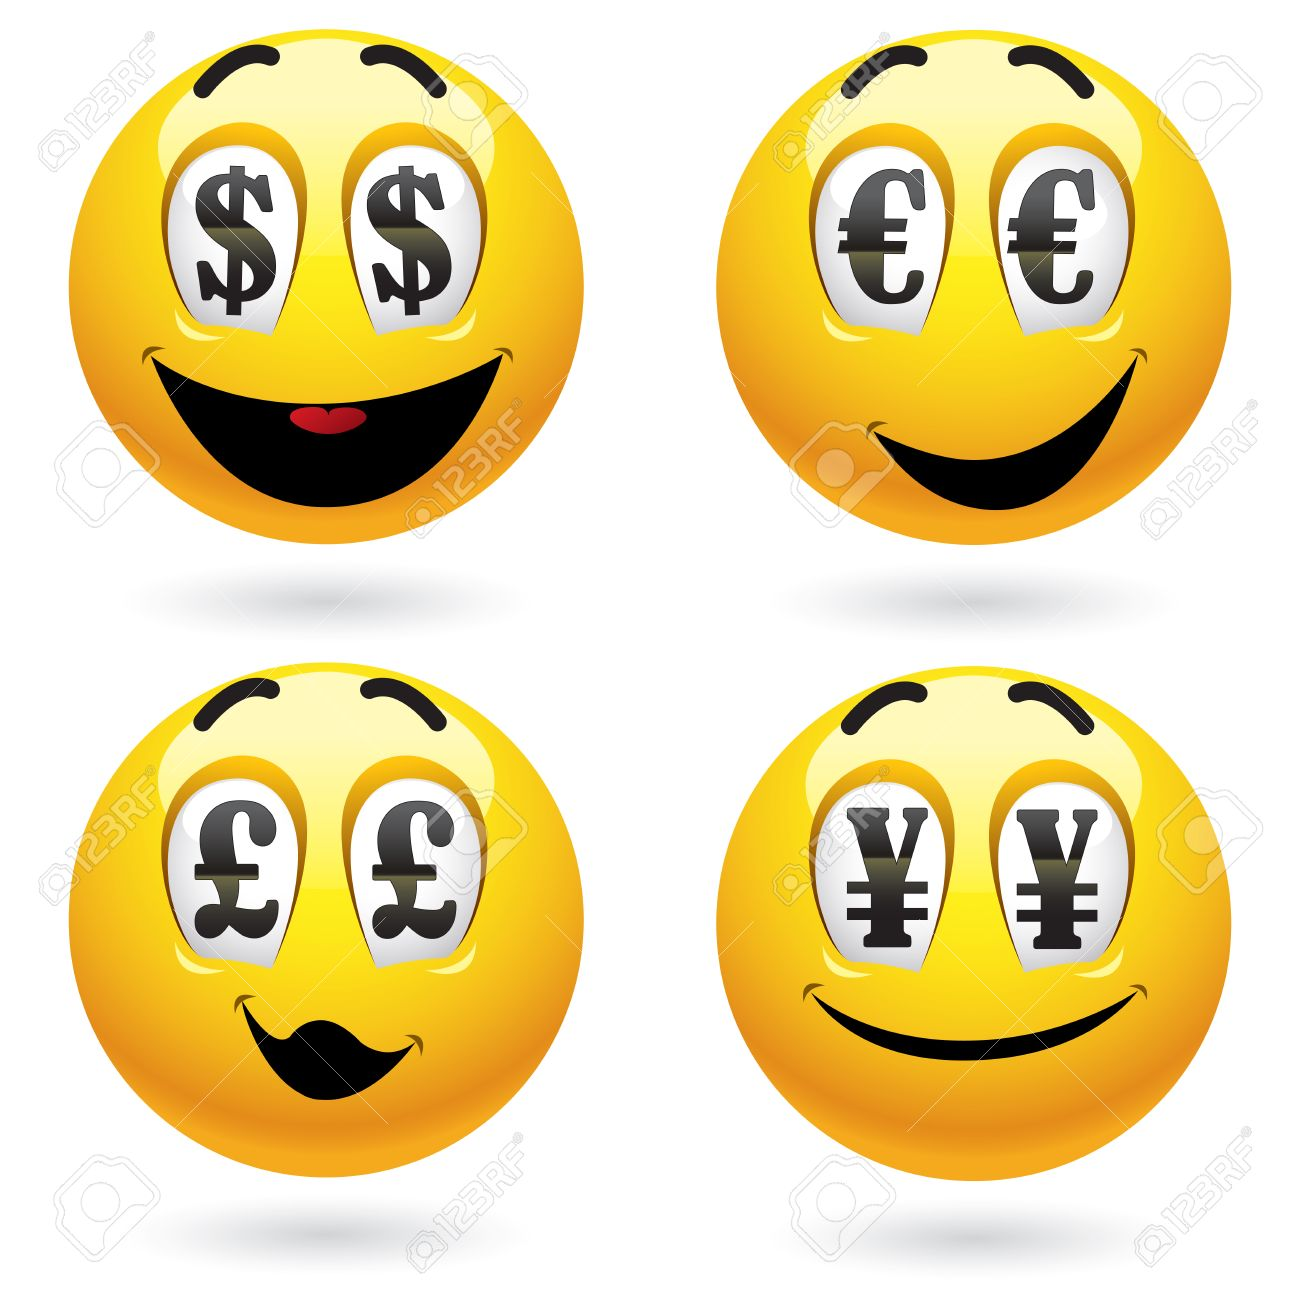 Smiley balls looking at money Stock Vector - 6004466